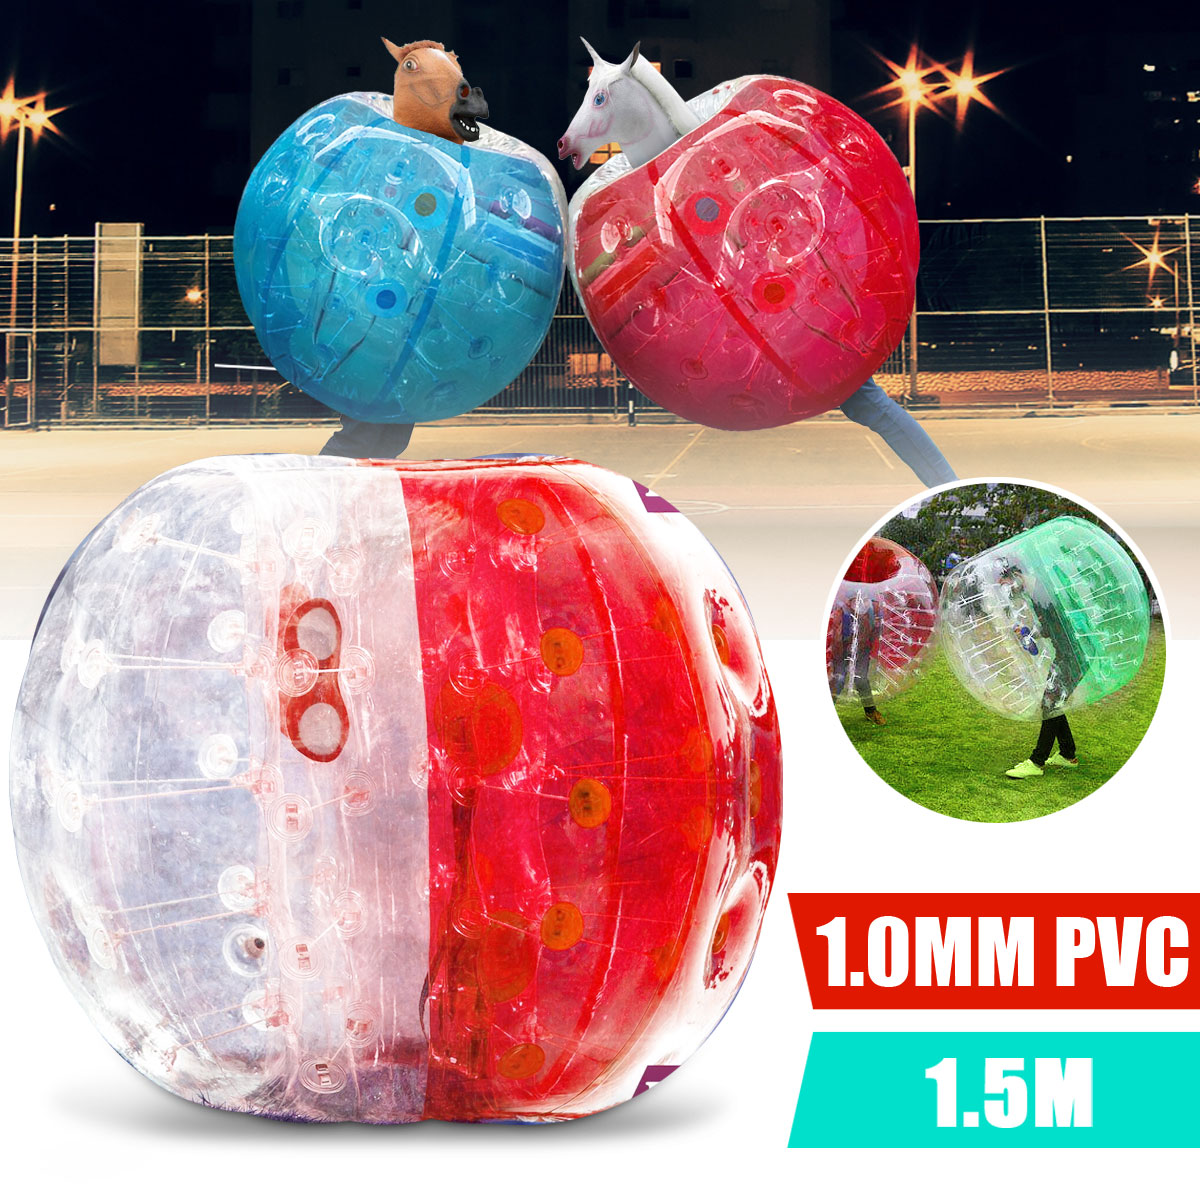 1.5m PVC Inflatable Bumper Ball Outdoor Entertainment Human Ball Bubble Soccer Football